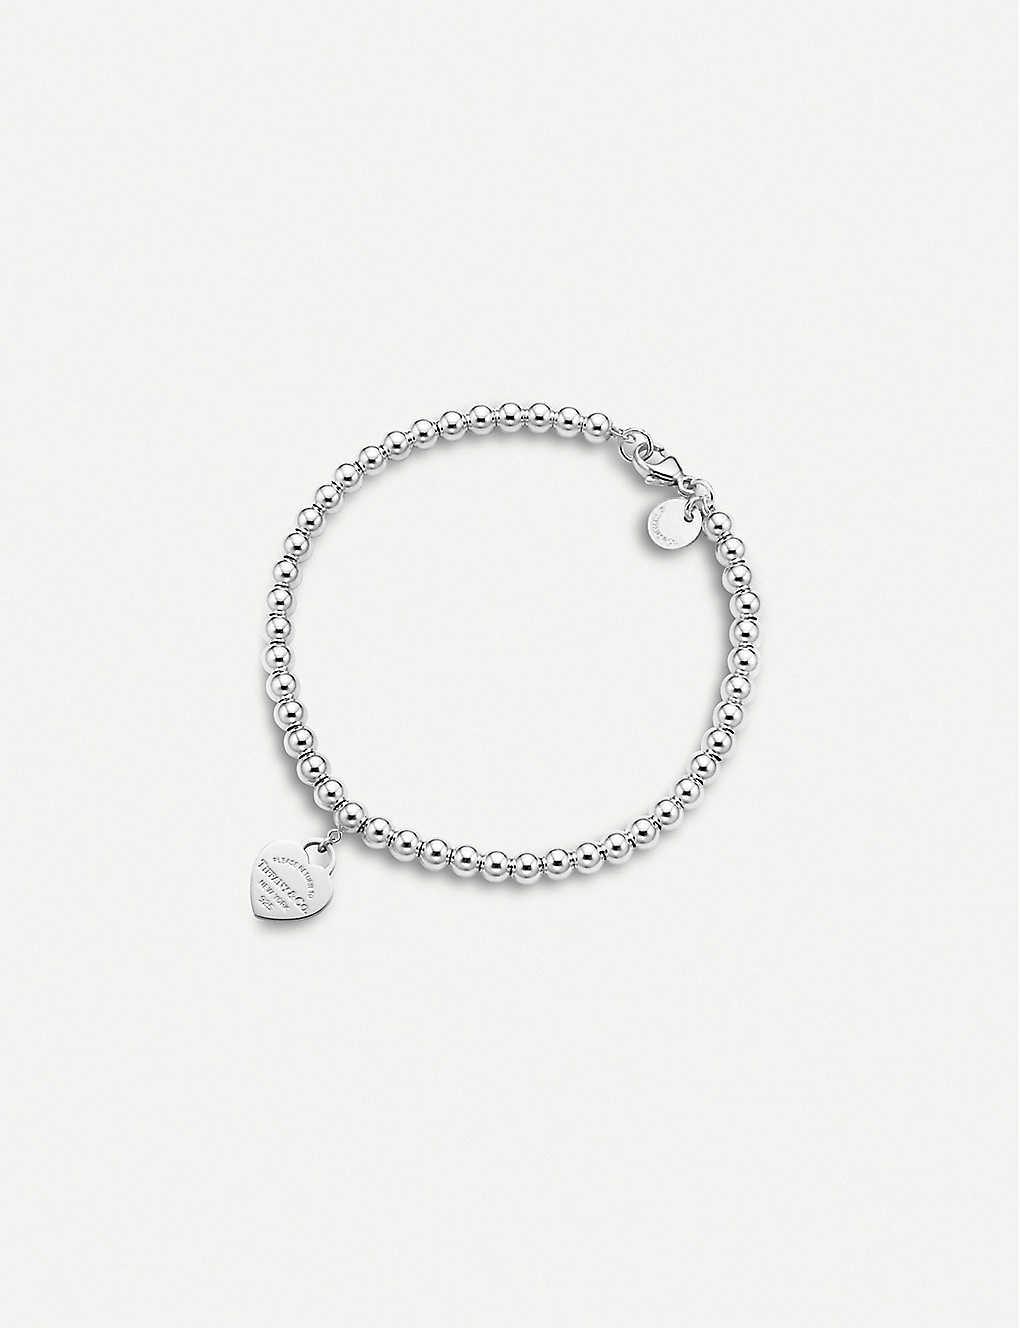 46b9c5f7b TIFFANY & CO - Return to Tiffany's heart tag sterling silver ...